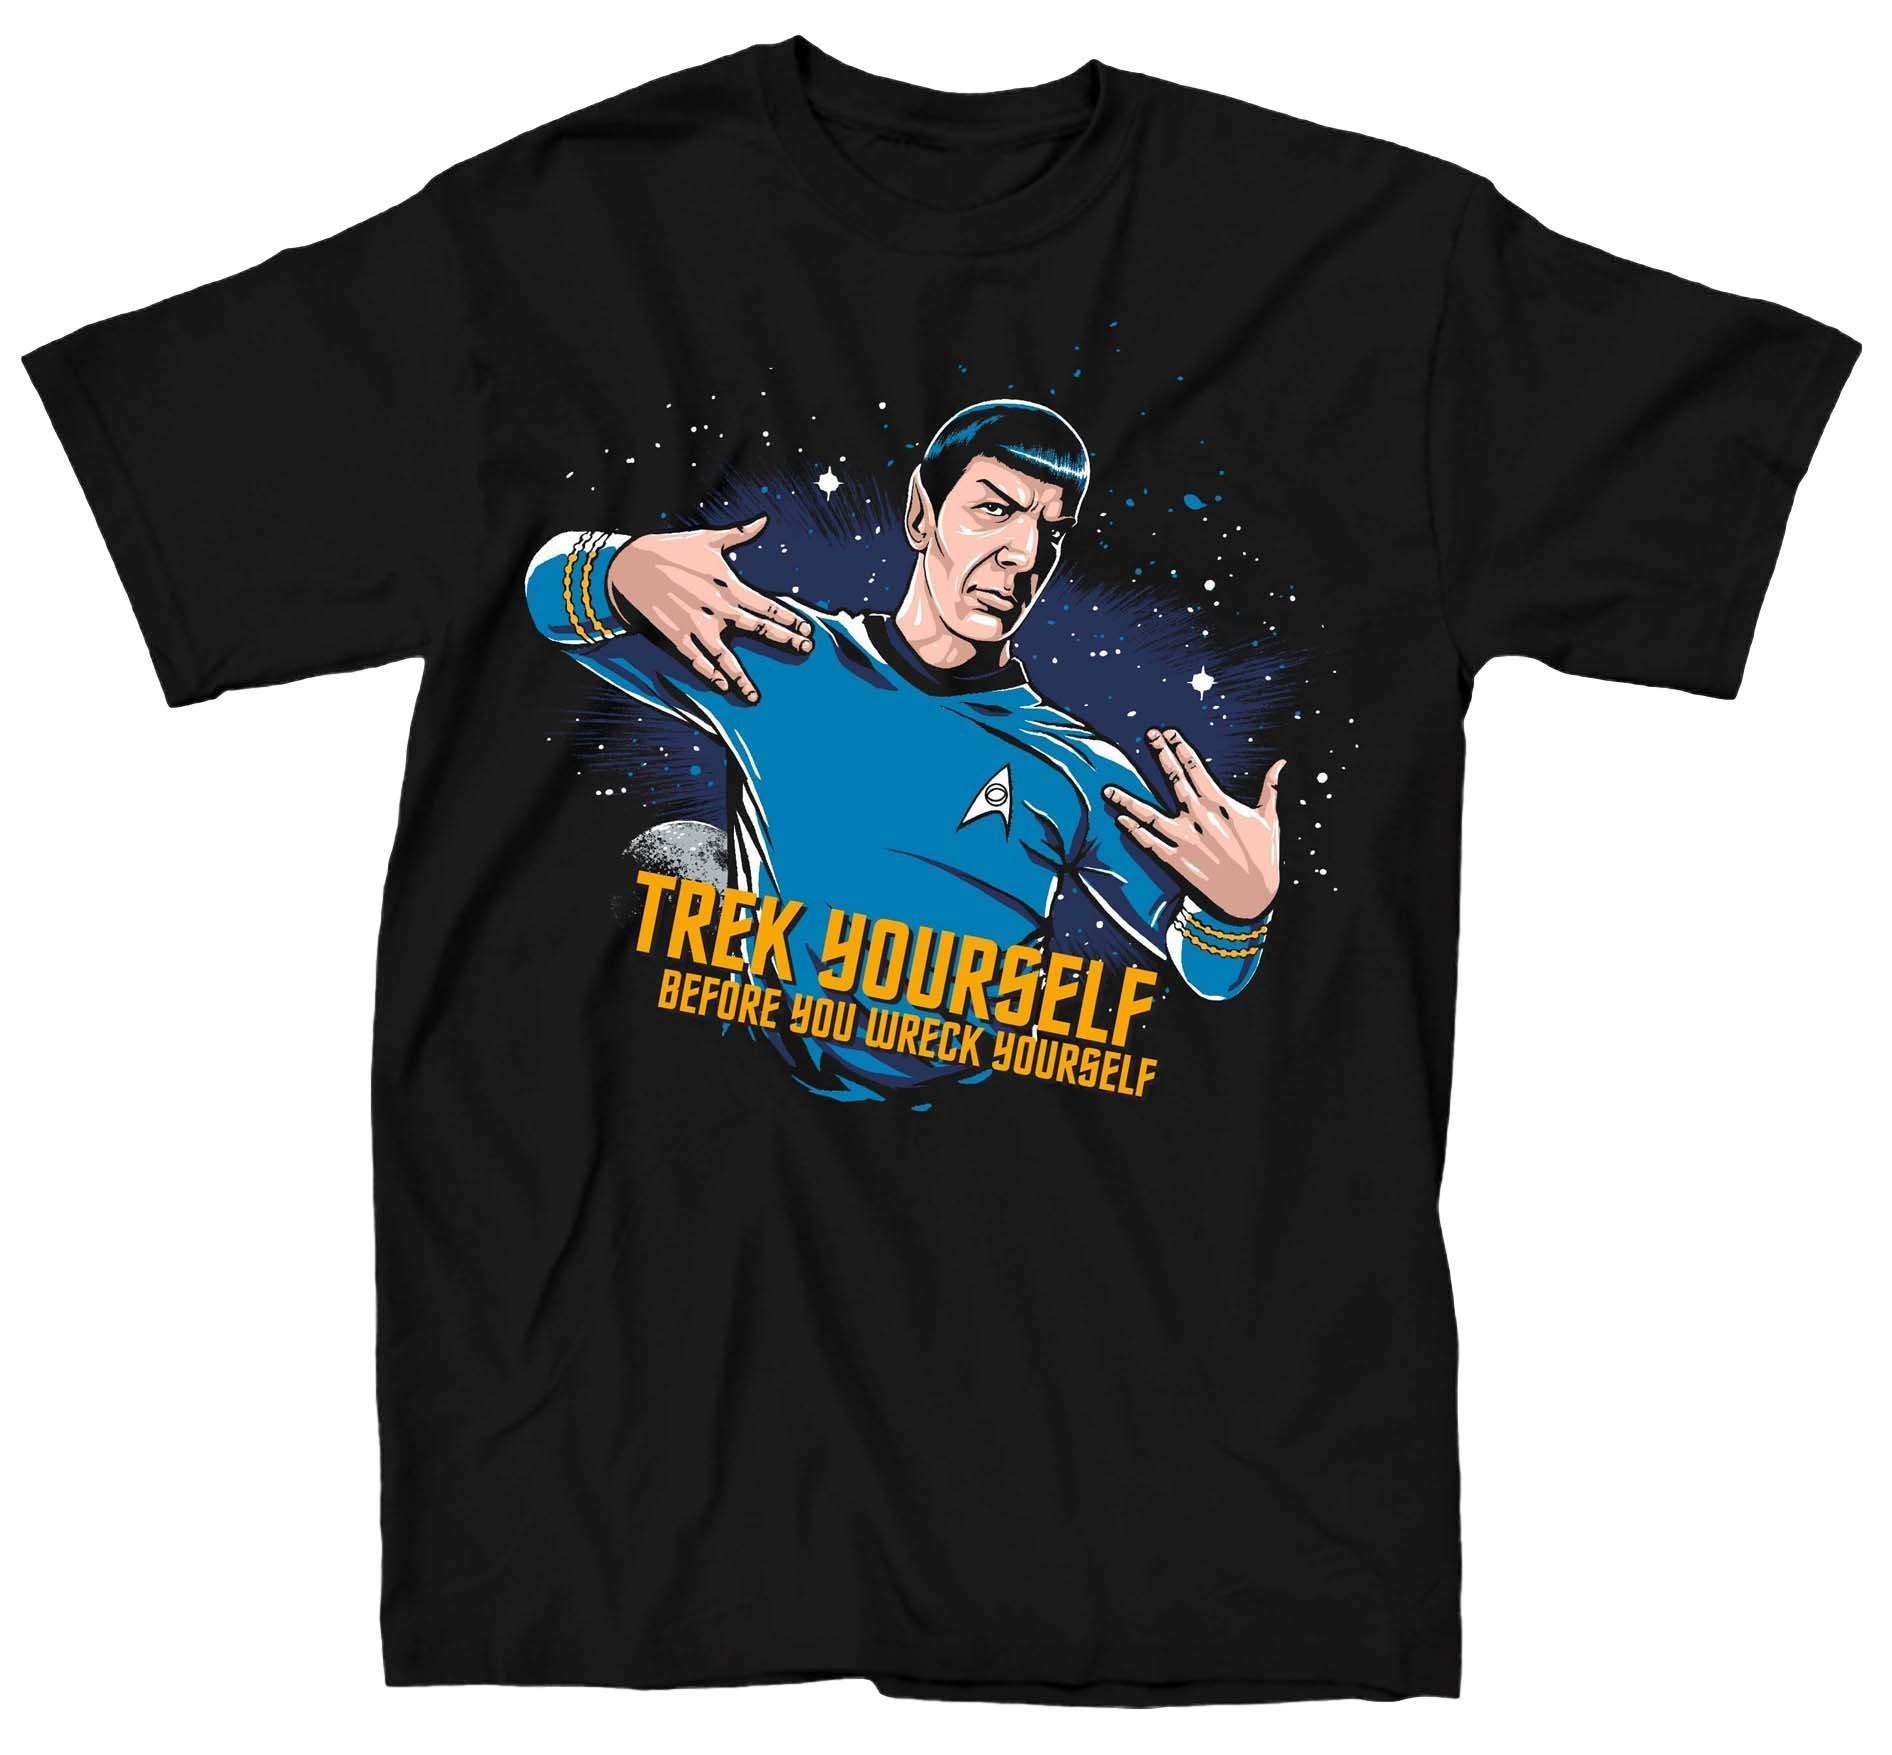 Star Trek Spock Trek Yourself Before Wreck Black Adult T-Shirt (Adult Large) by Star Trek (Image #1)